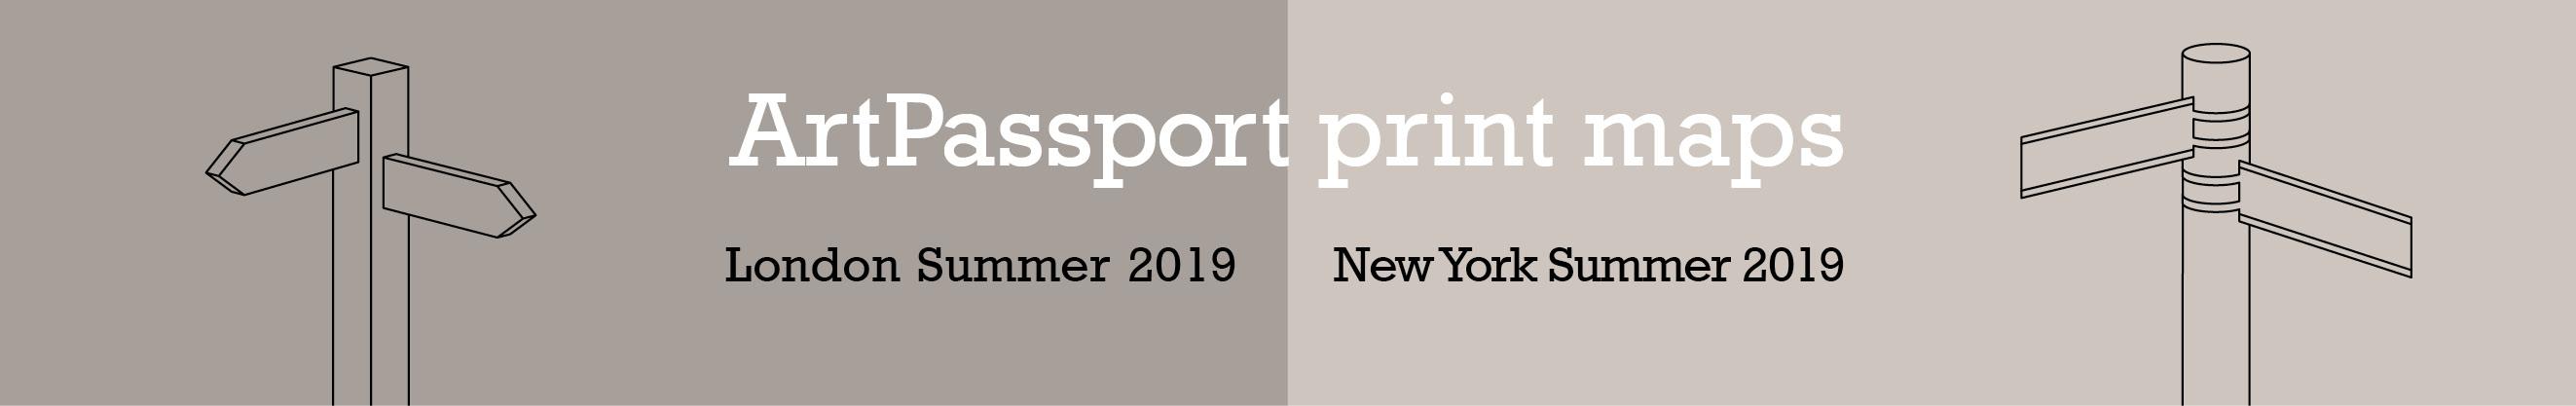 ArtPassport Summer print maps available now